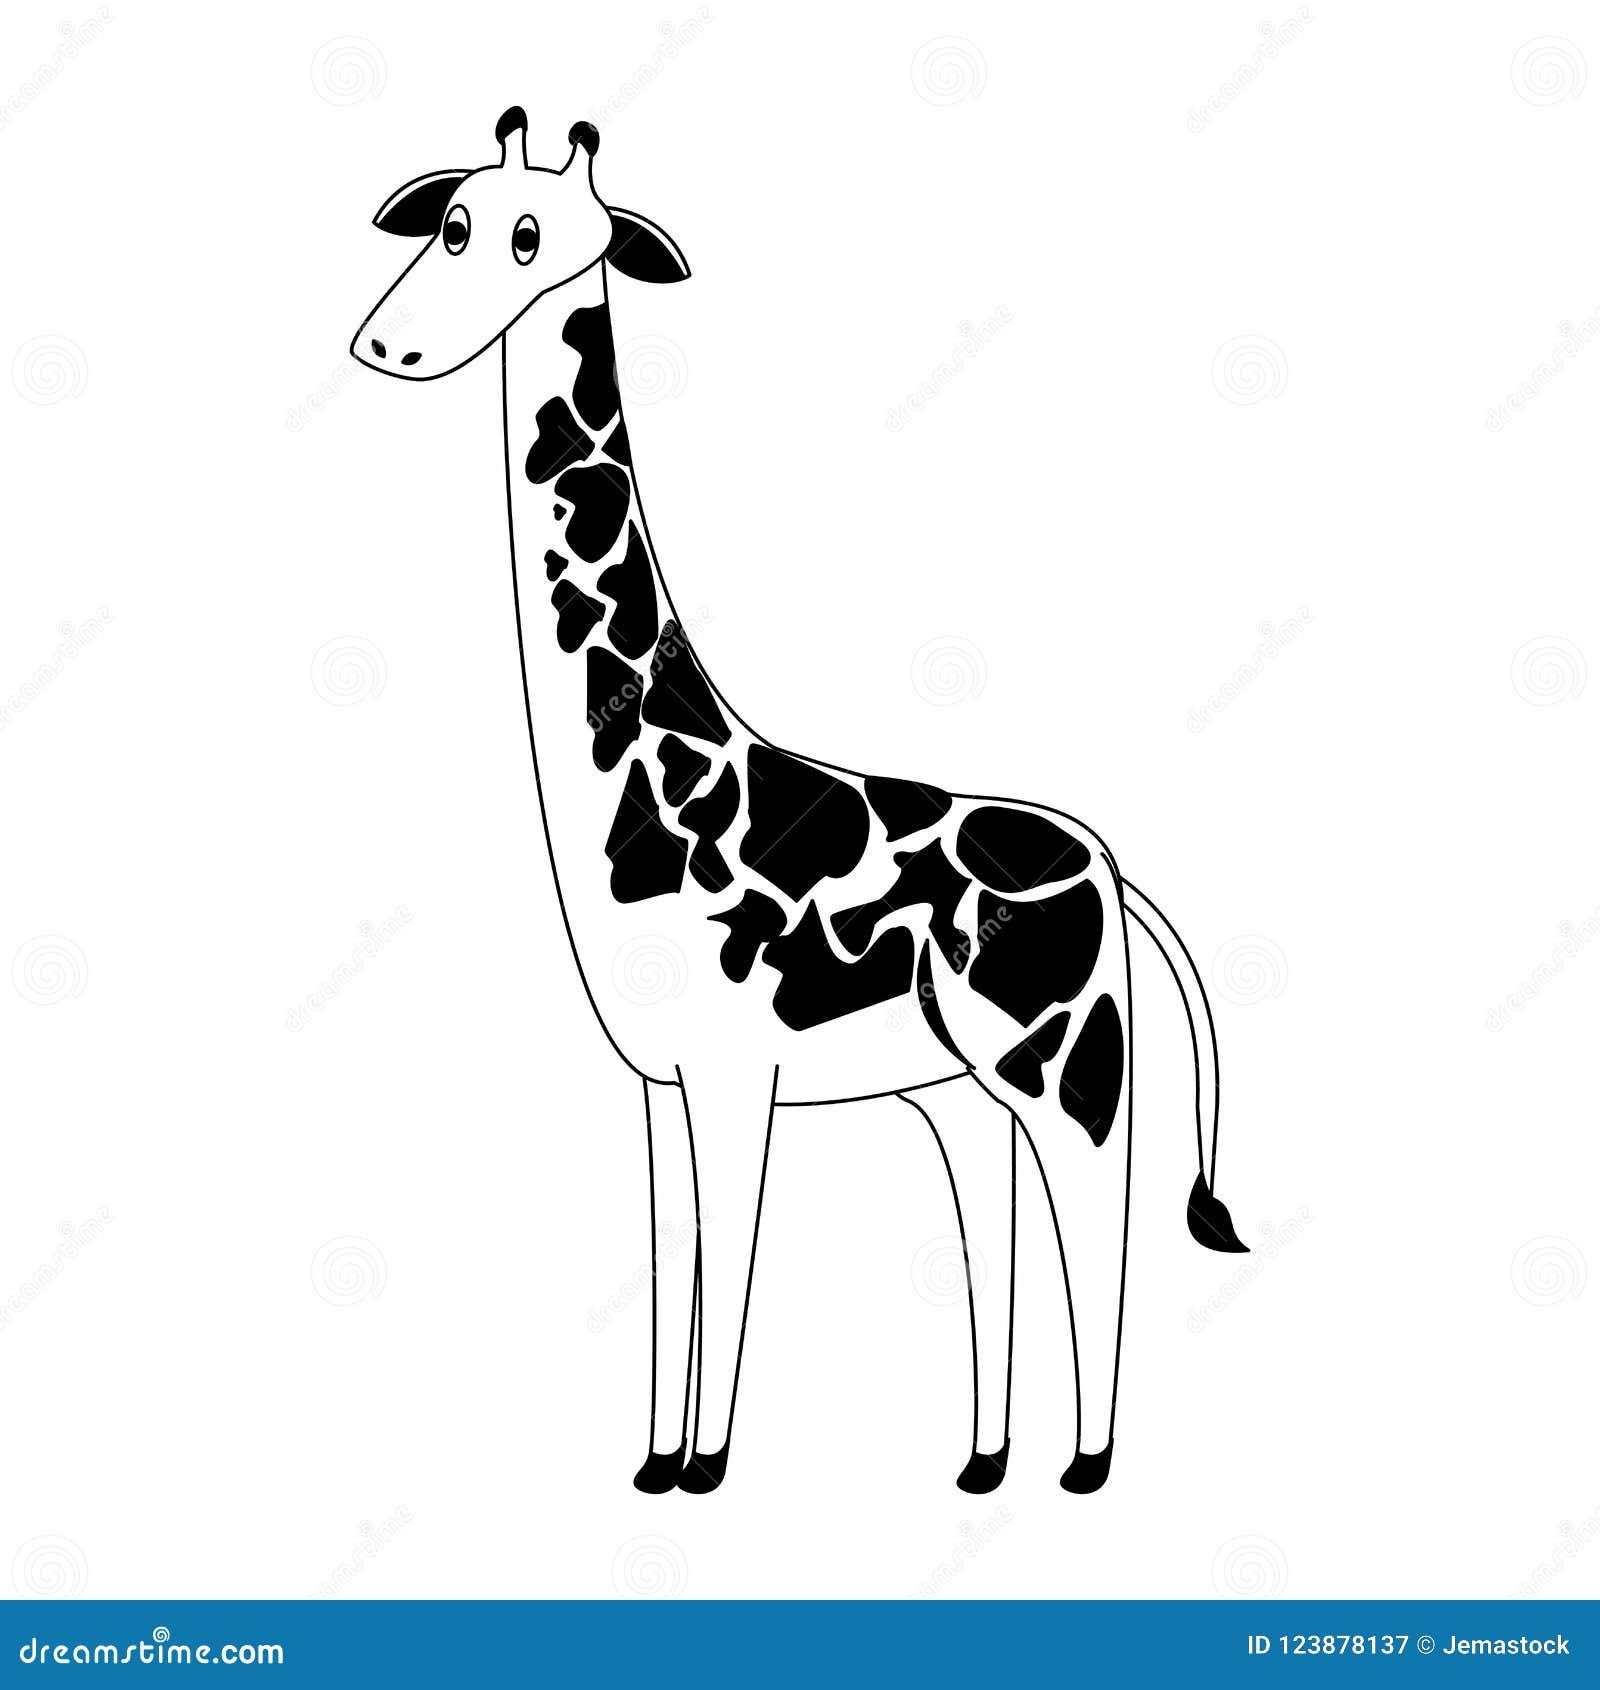 Giraffe Wild Animal In Black And White Stock Vector Illustration